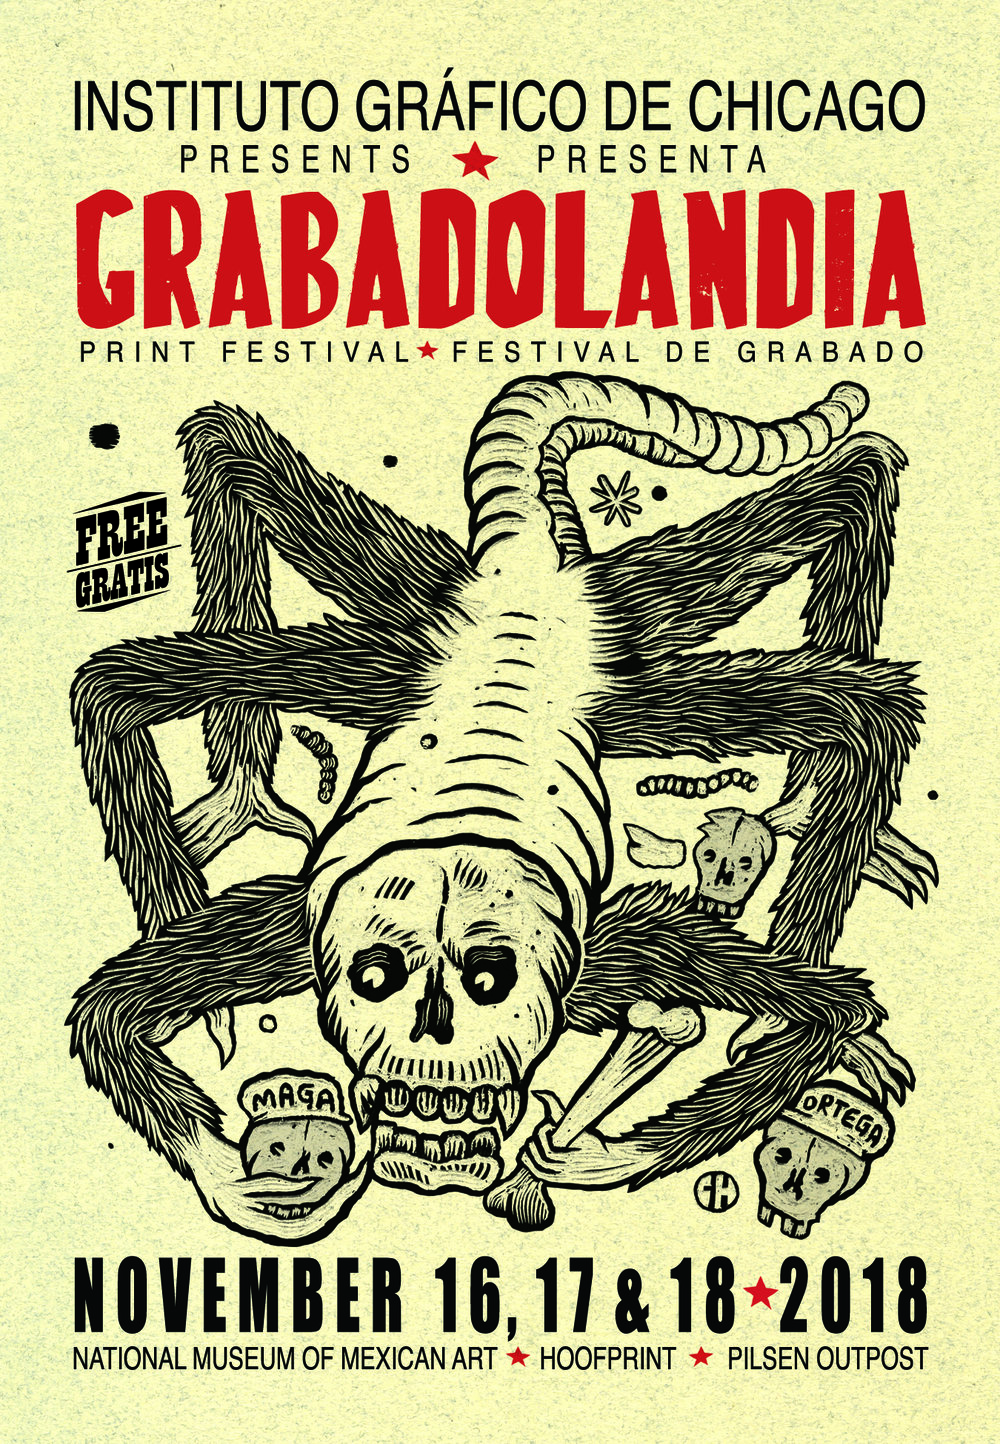 GRABADOLANDIA-POSTCARD-FRONT-www.jpg